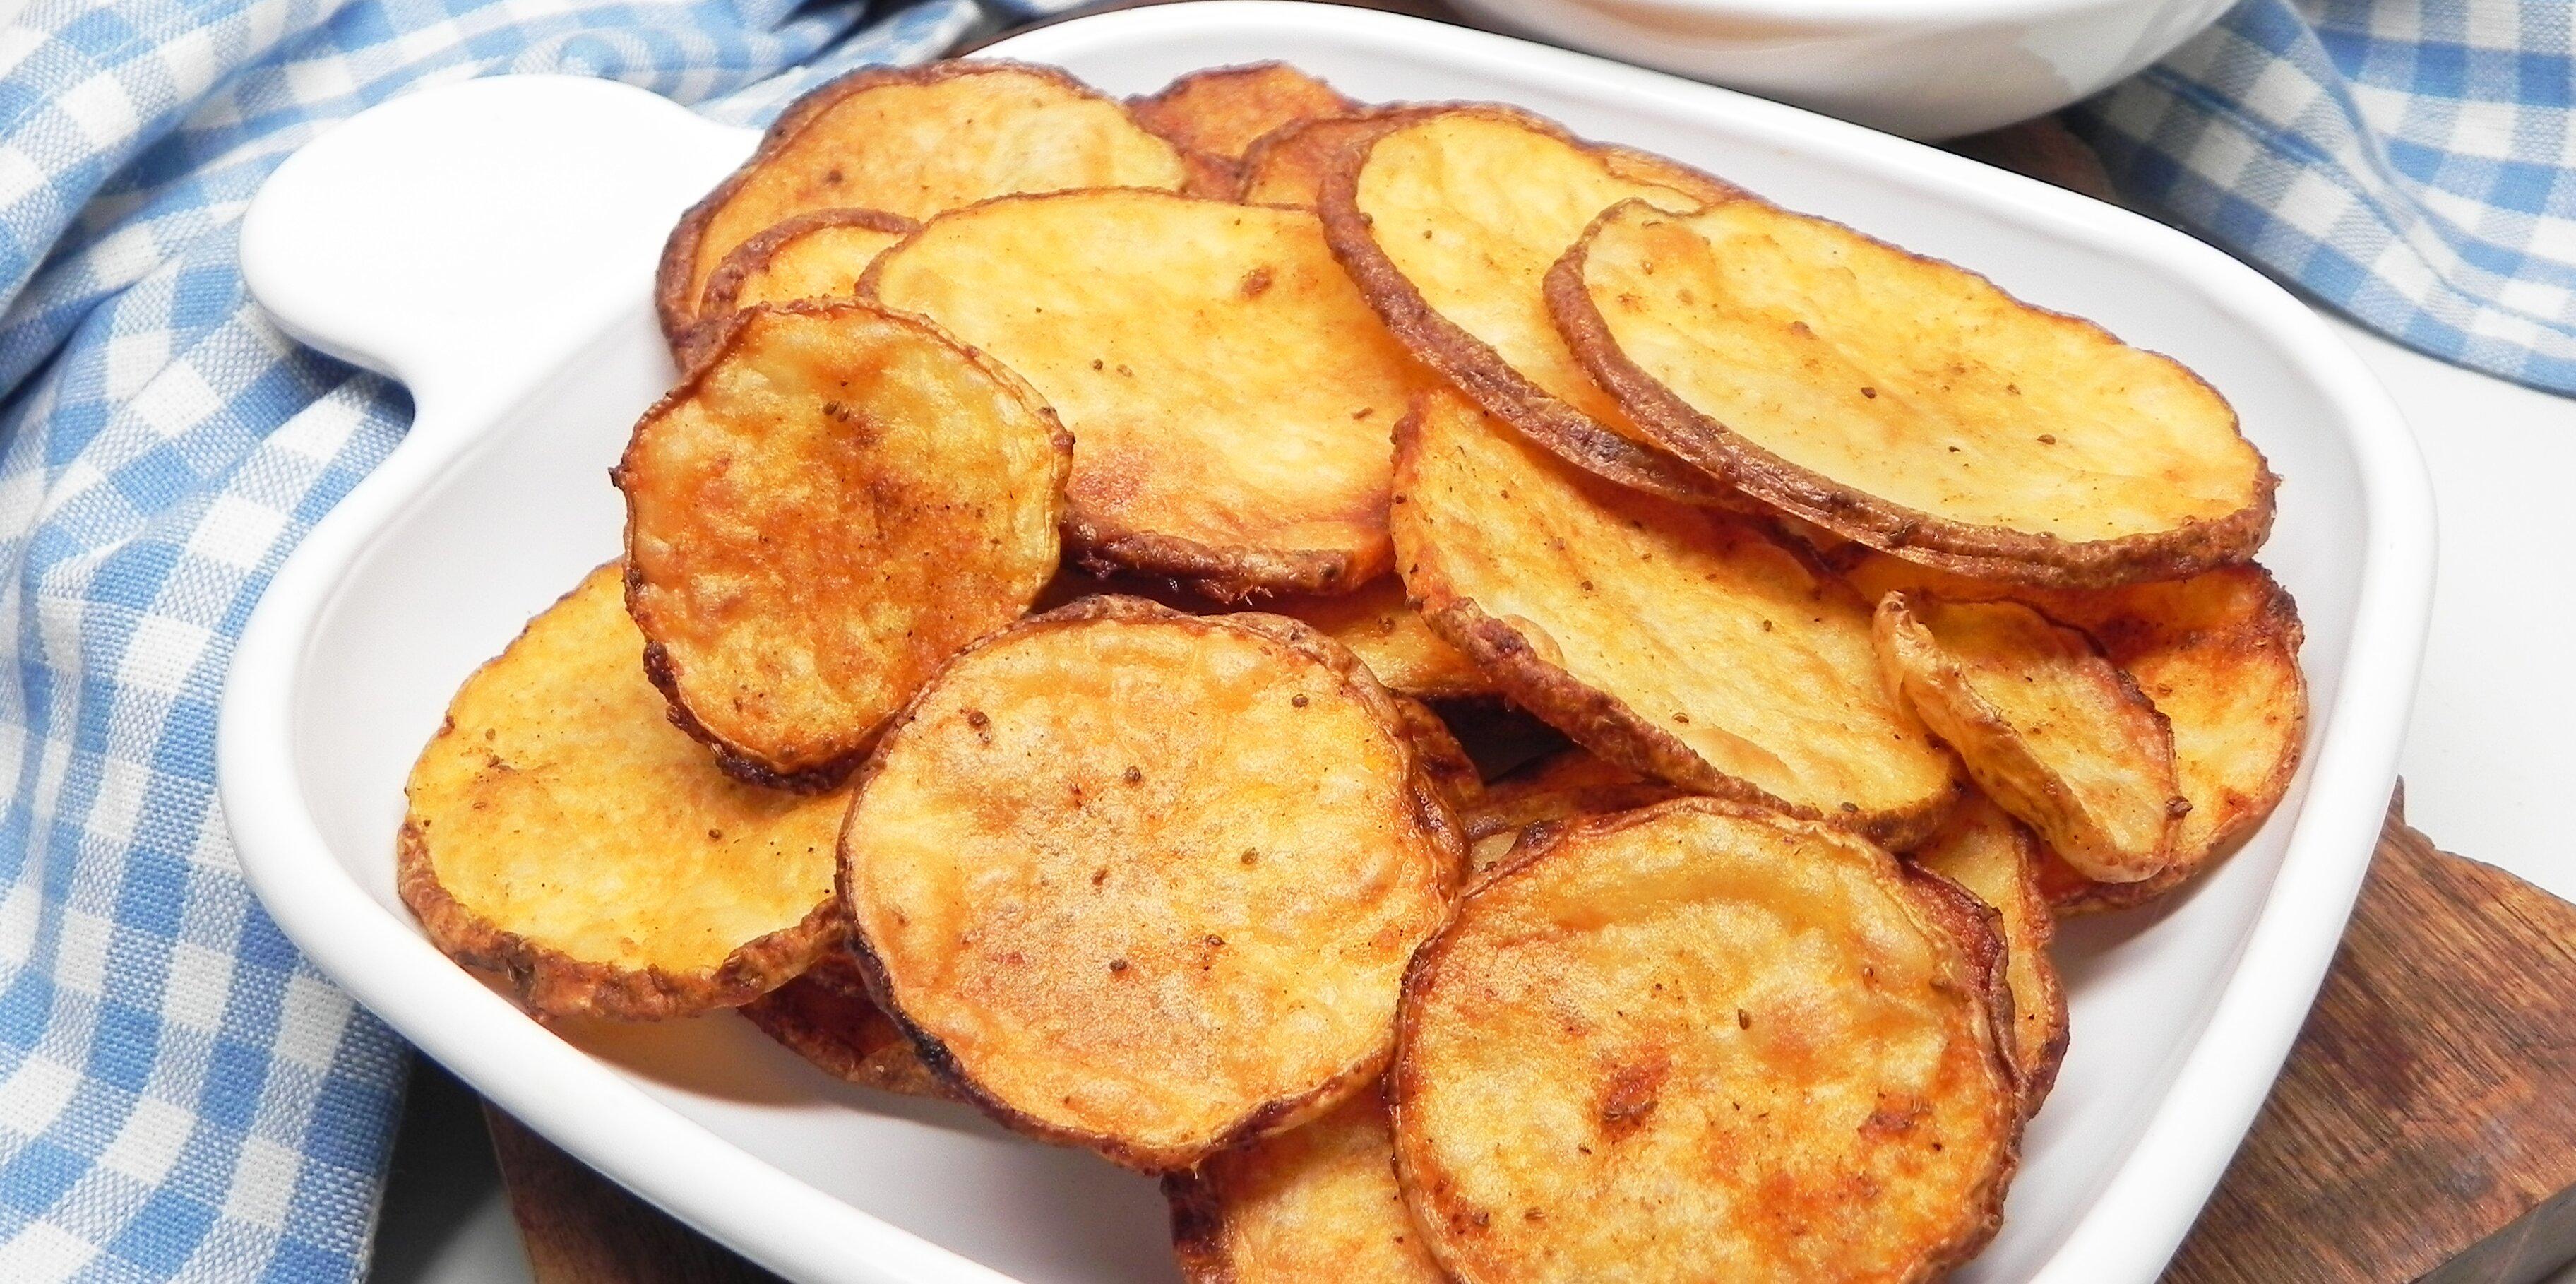 oven baked potato slices recipe